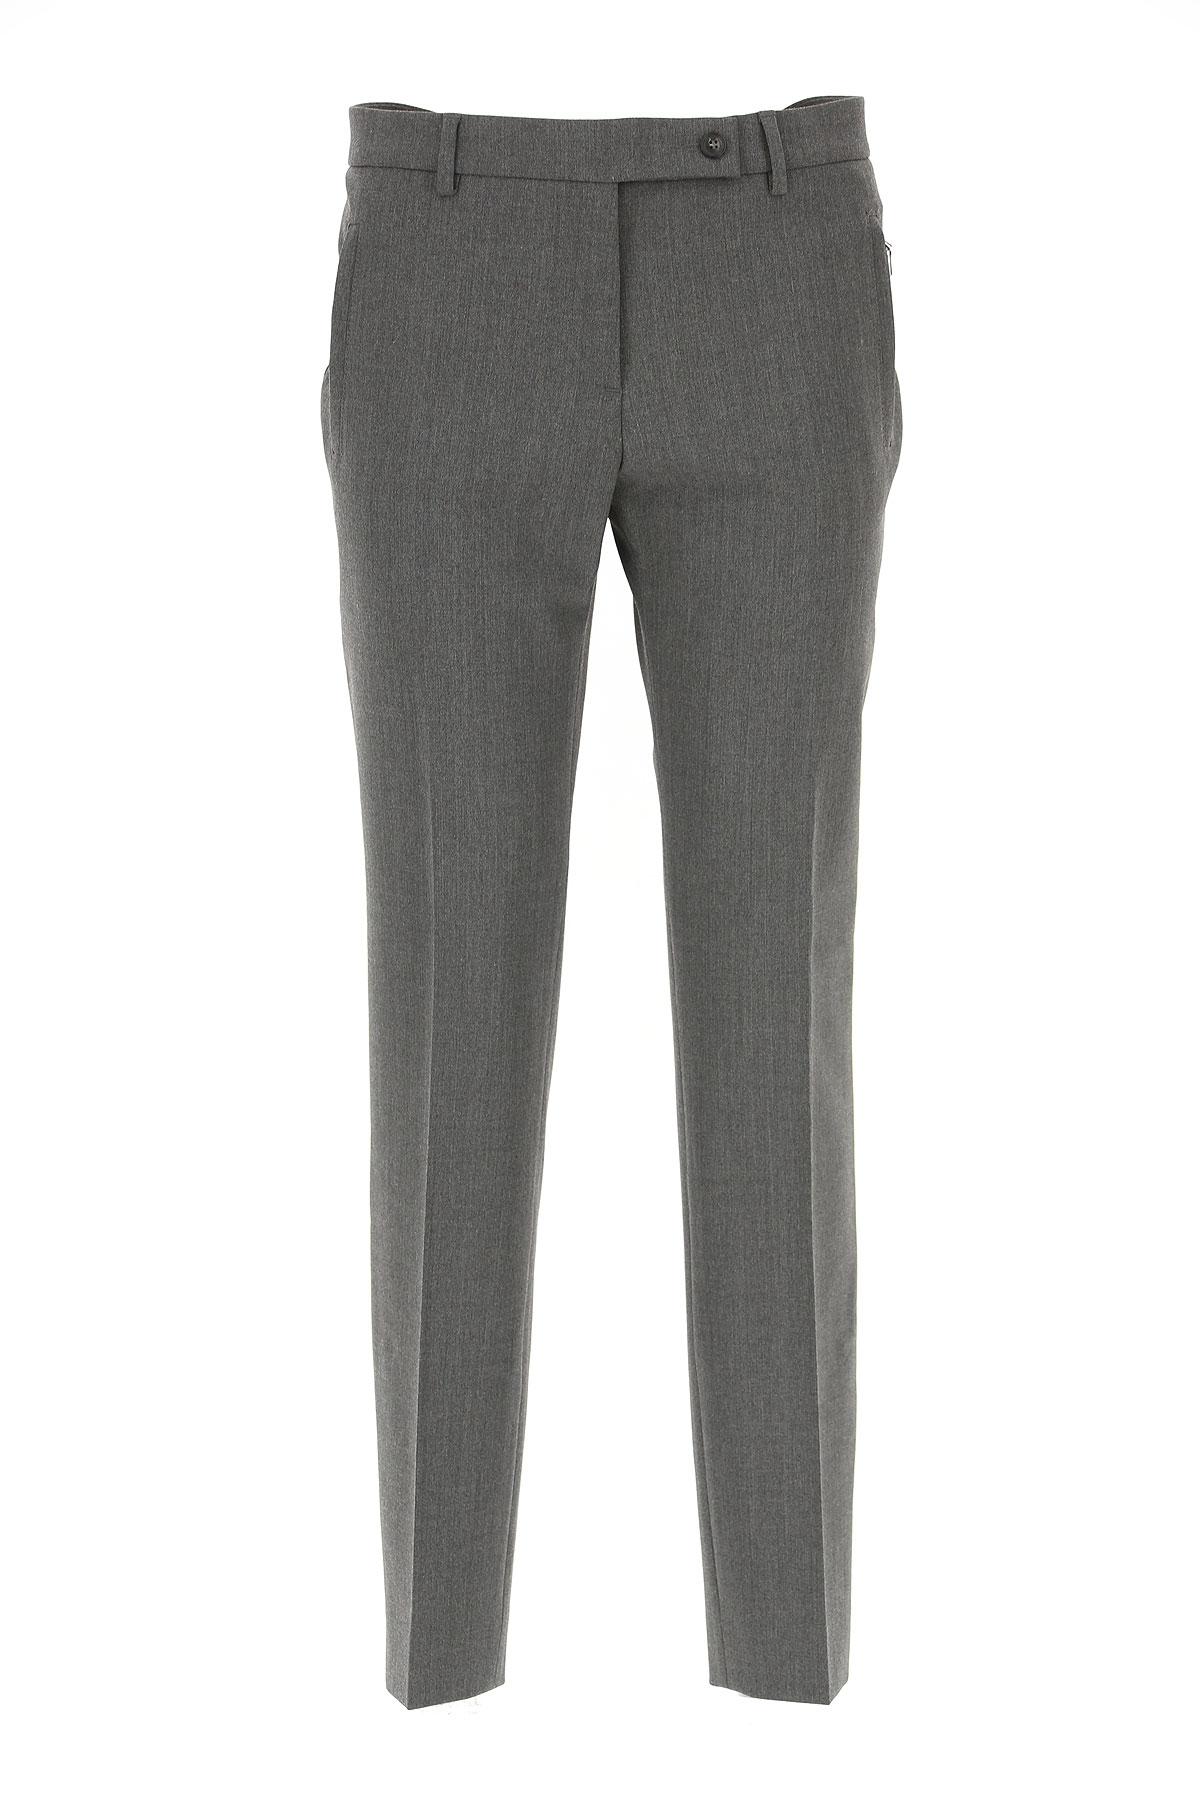 Image of Seventy Pants for Women, Medium Grey, polyester, 2017, 10 12 2 4 6 8